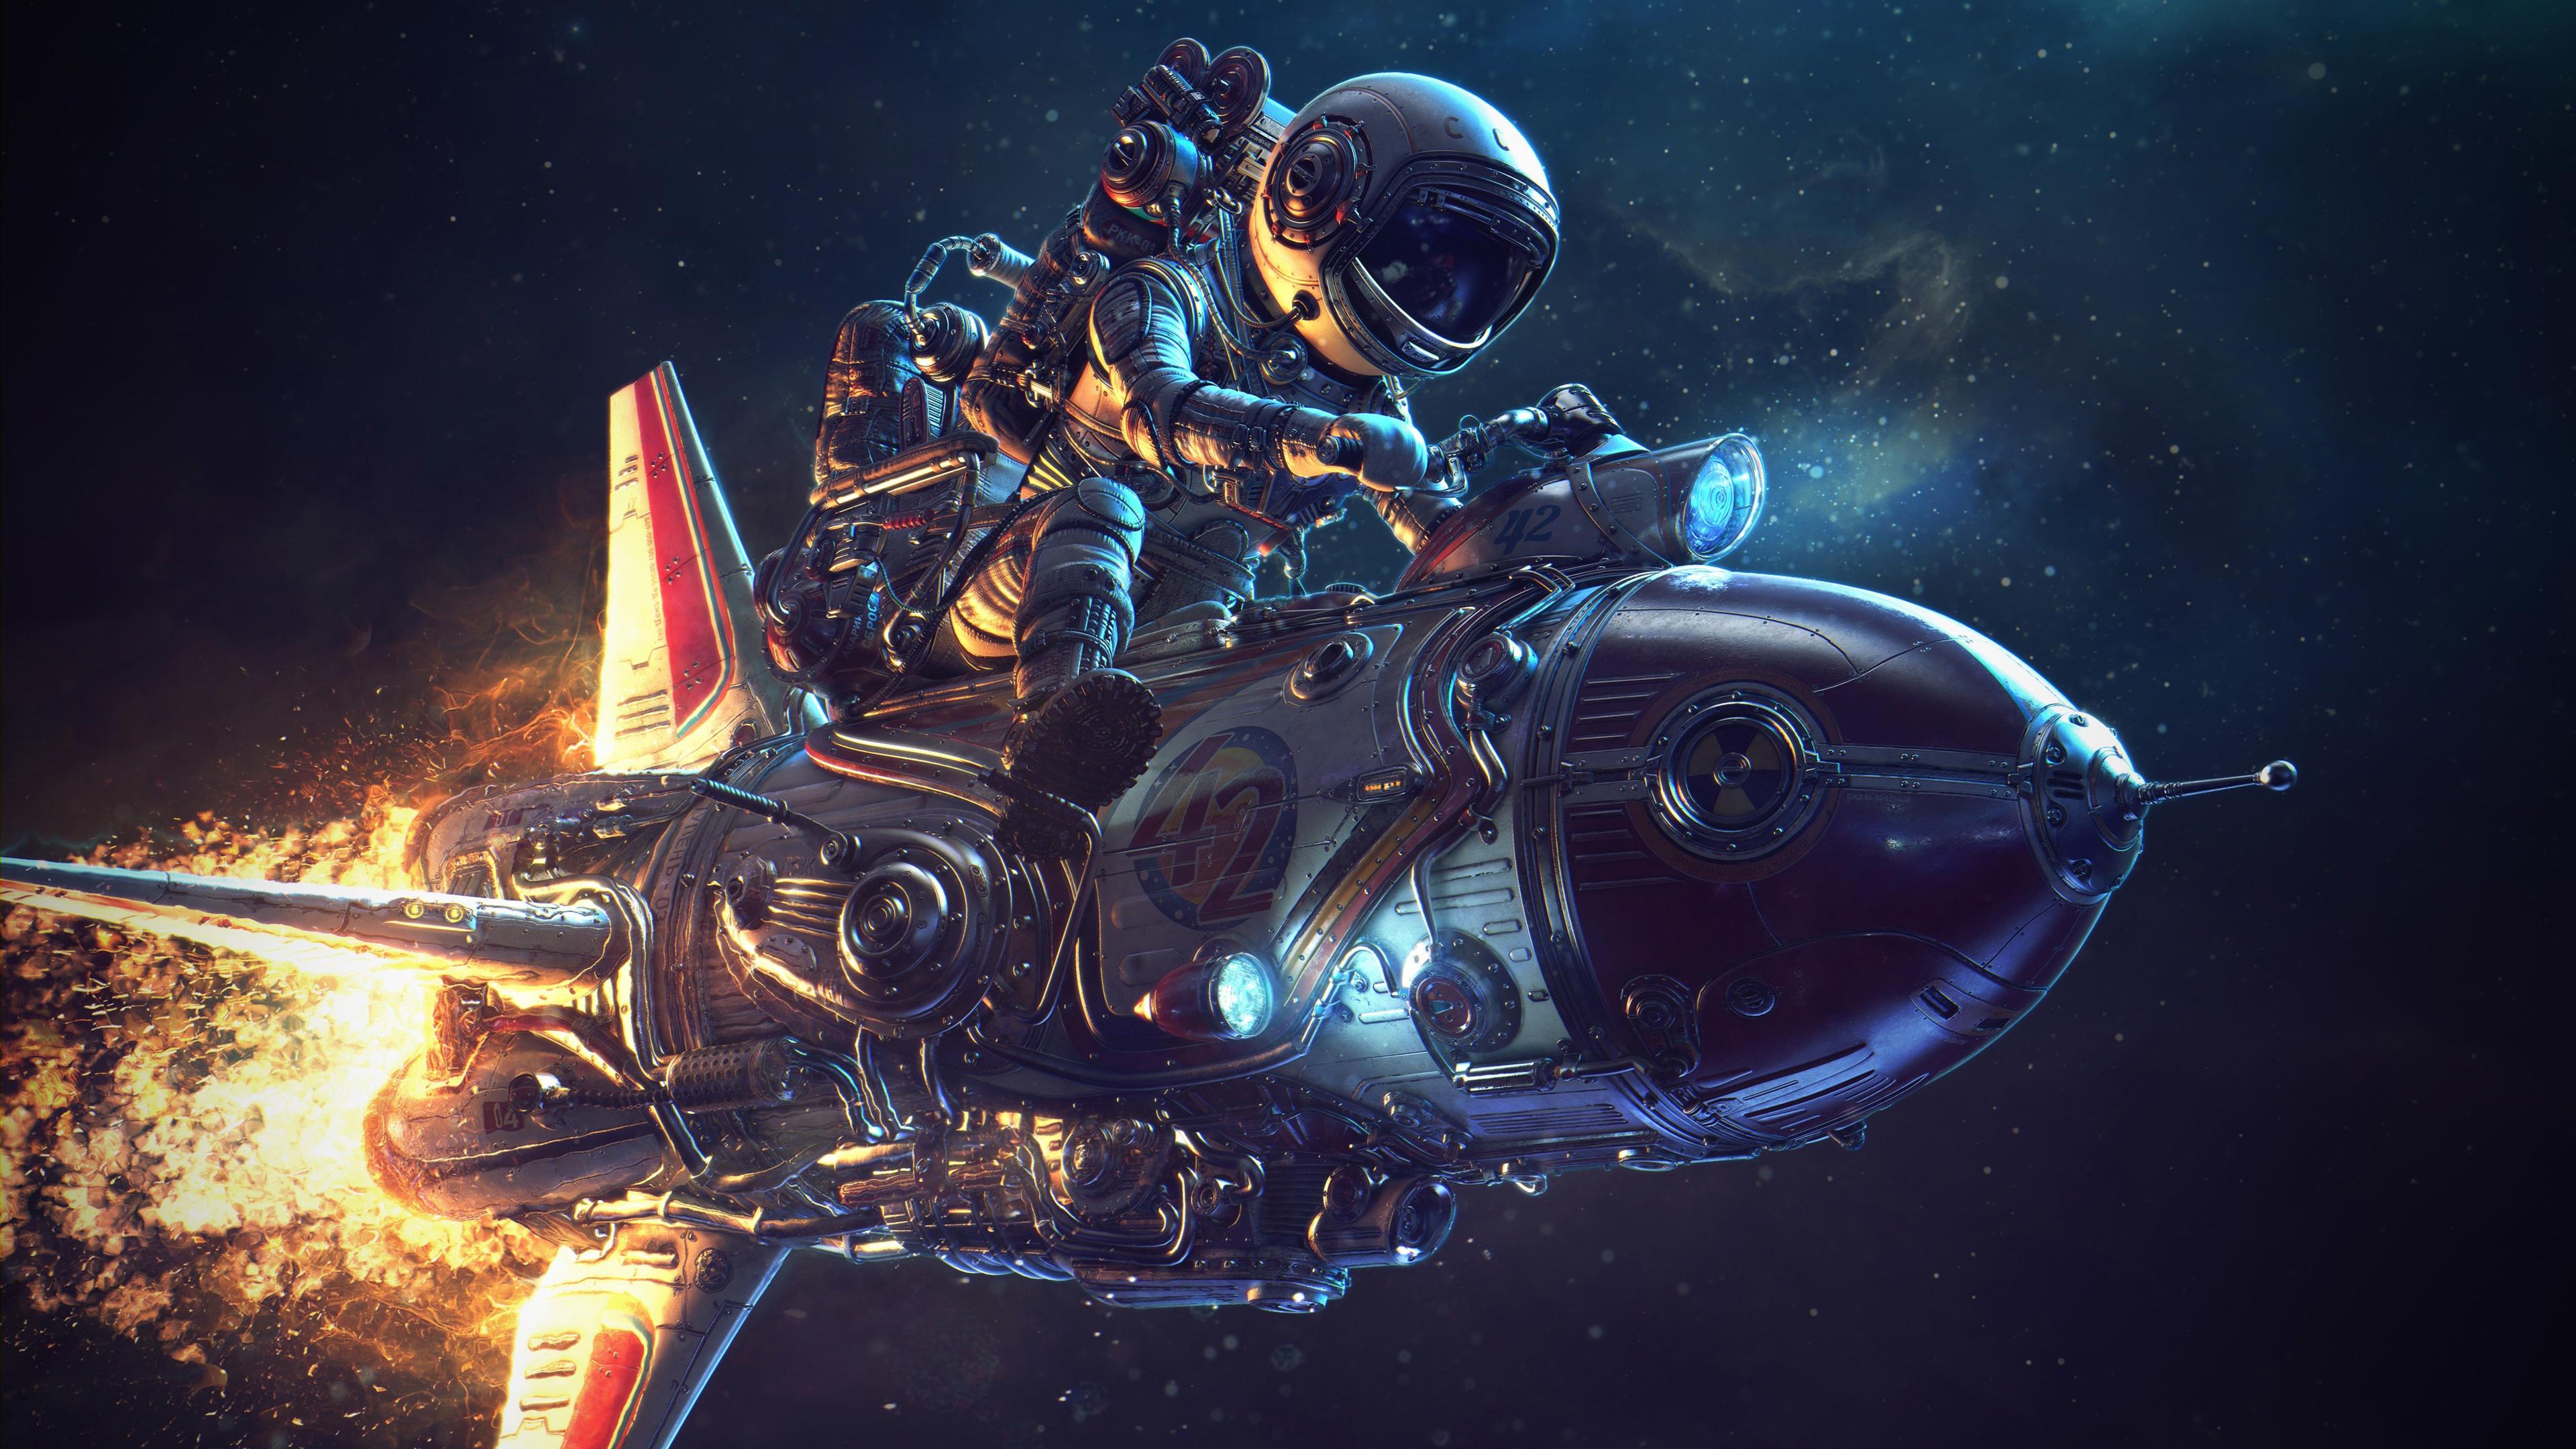 astronaut rocket science fiction 4k 1540754363 - Astronaut Rocket Science Fiction 4k - science fiction wallpapers, rocket wallpapers, hd-wallpapers, digital art wallpapers, astronaut wallpapers, artwork wallpapers, artist wallpapers, 4k-wallpapers